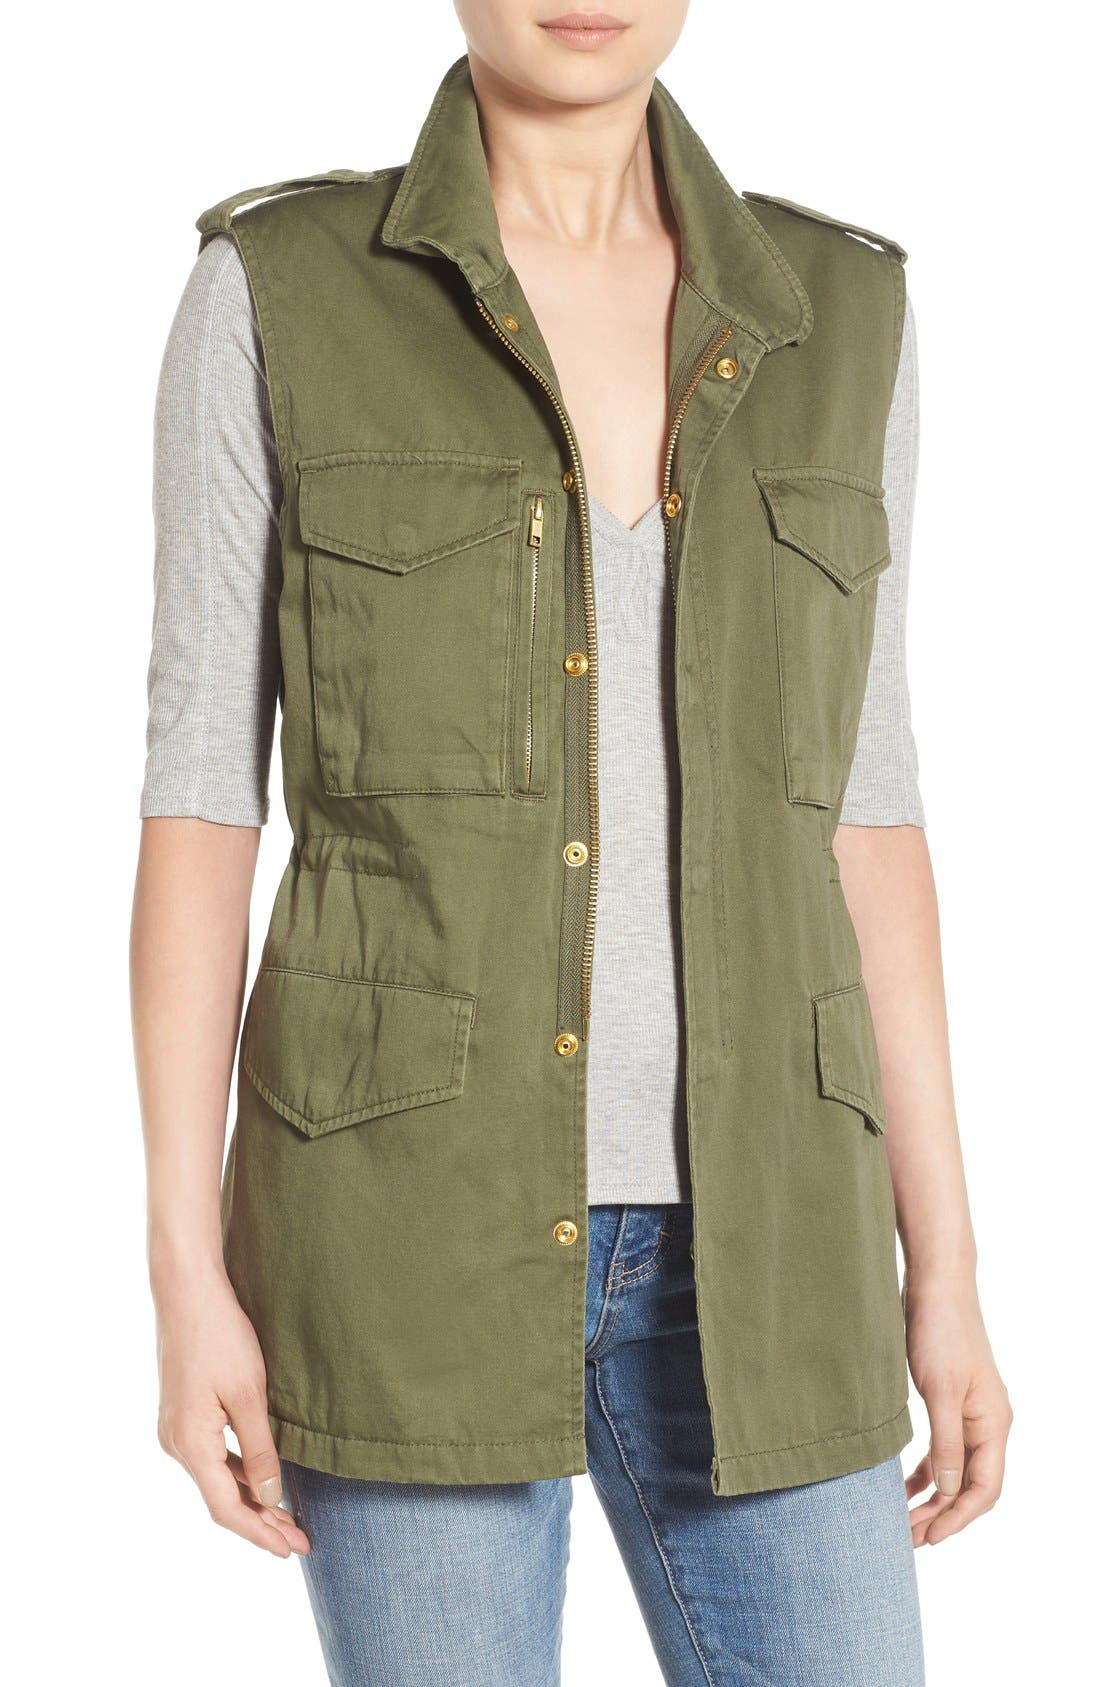 Main Image - Thread & Supply Utility Vest